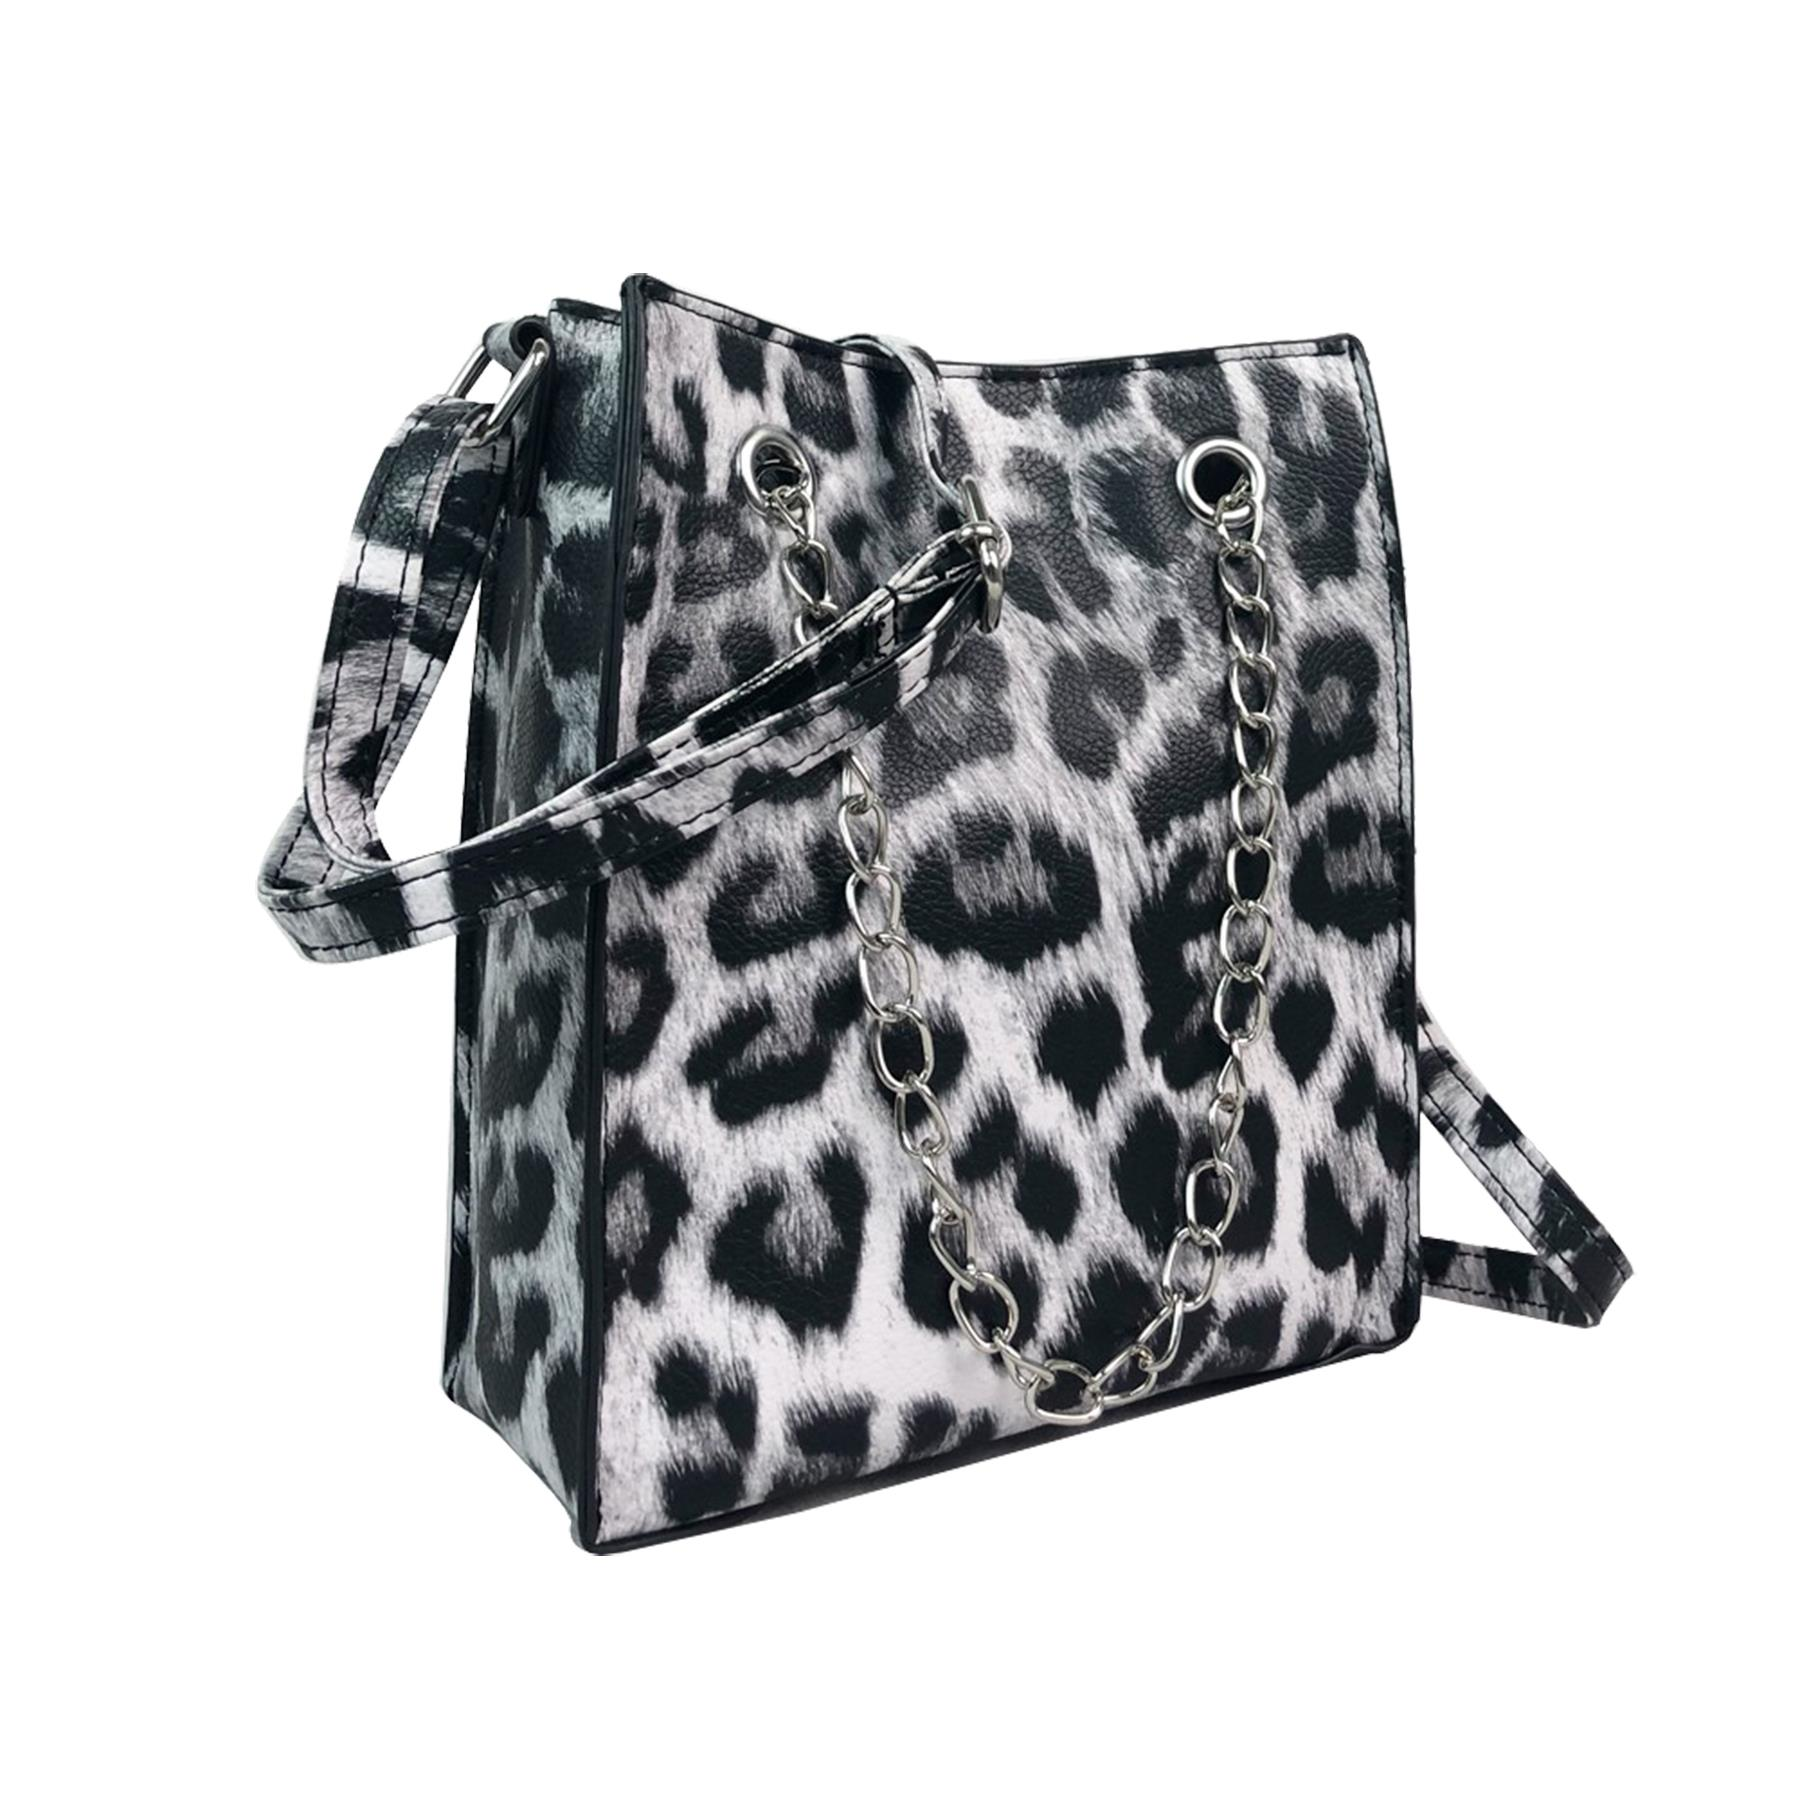 New-Women-s-Zebra-Leopard-Print-Faux-Leather-Fashion-Shoulder-Bags thumbnail 3